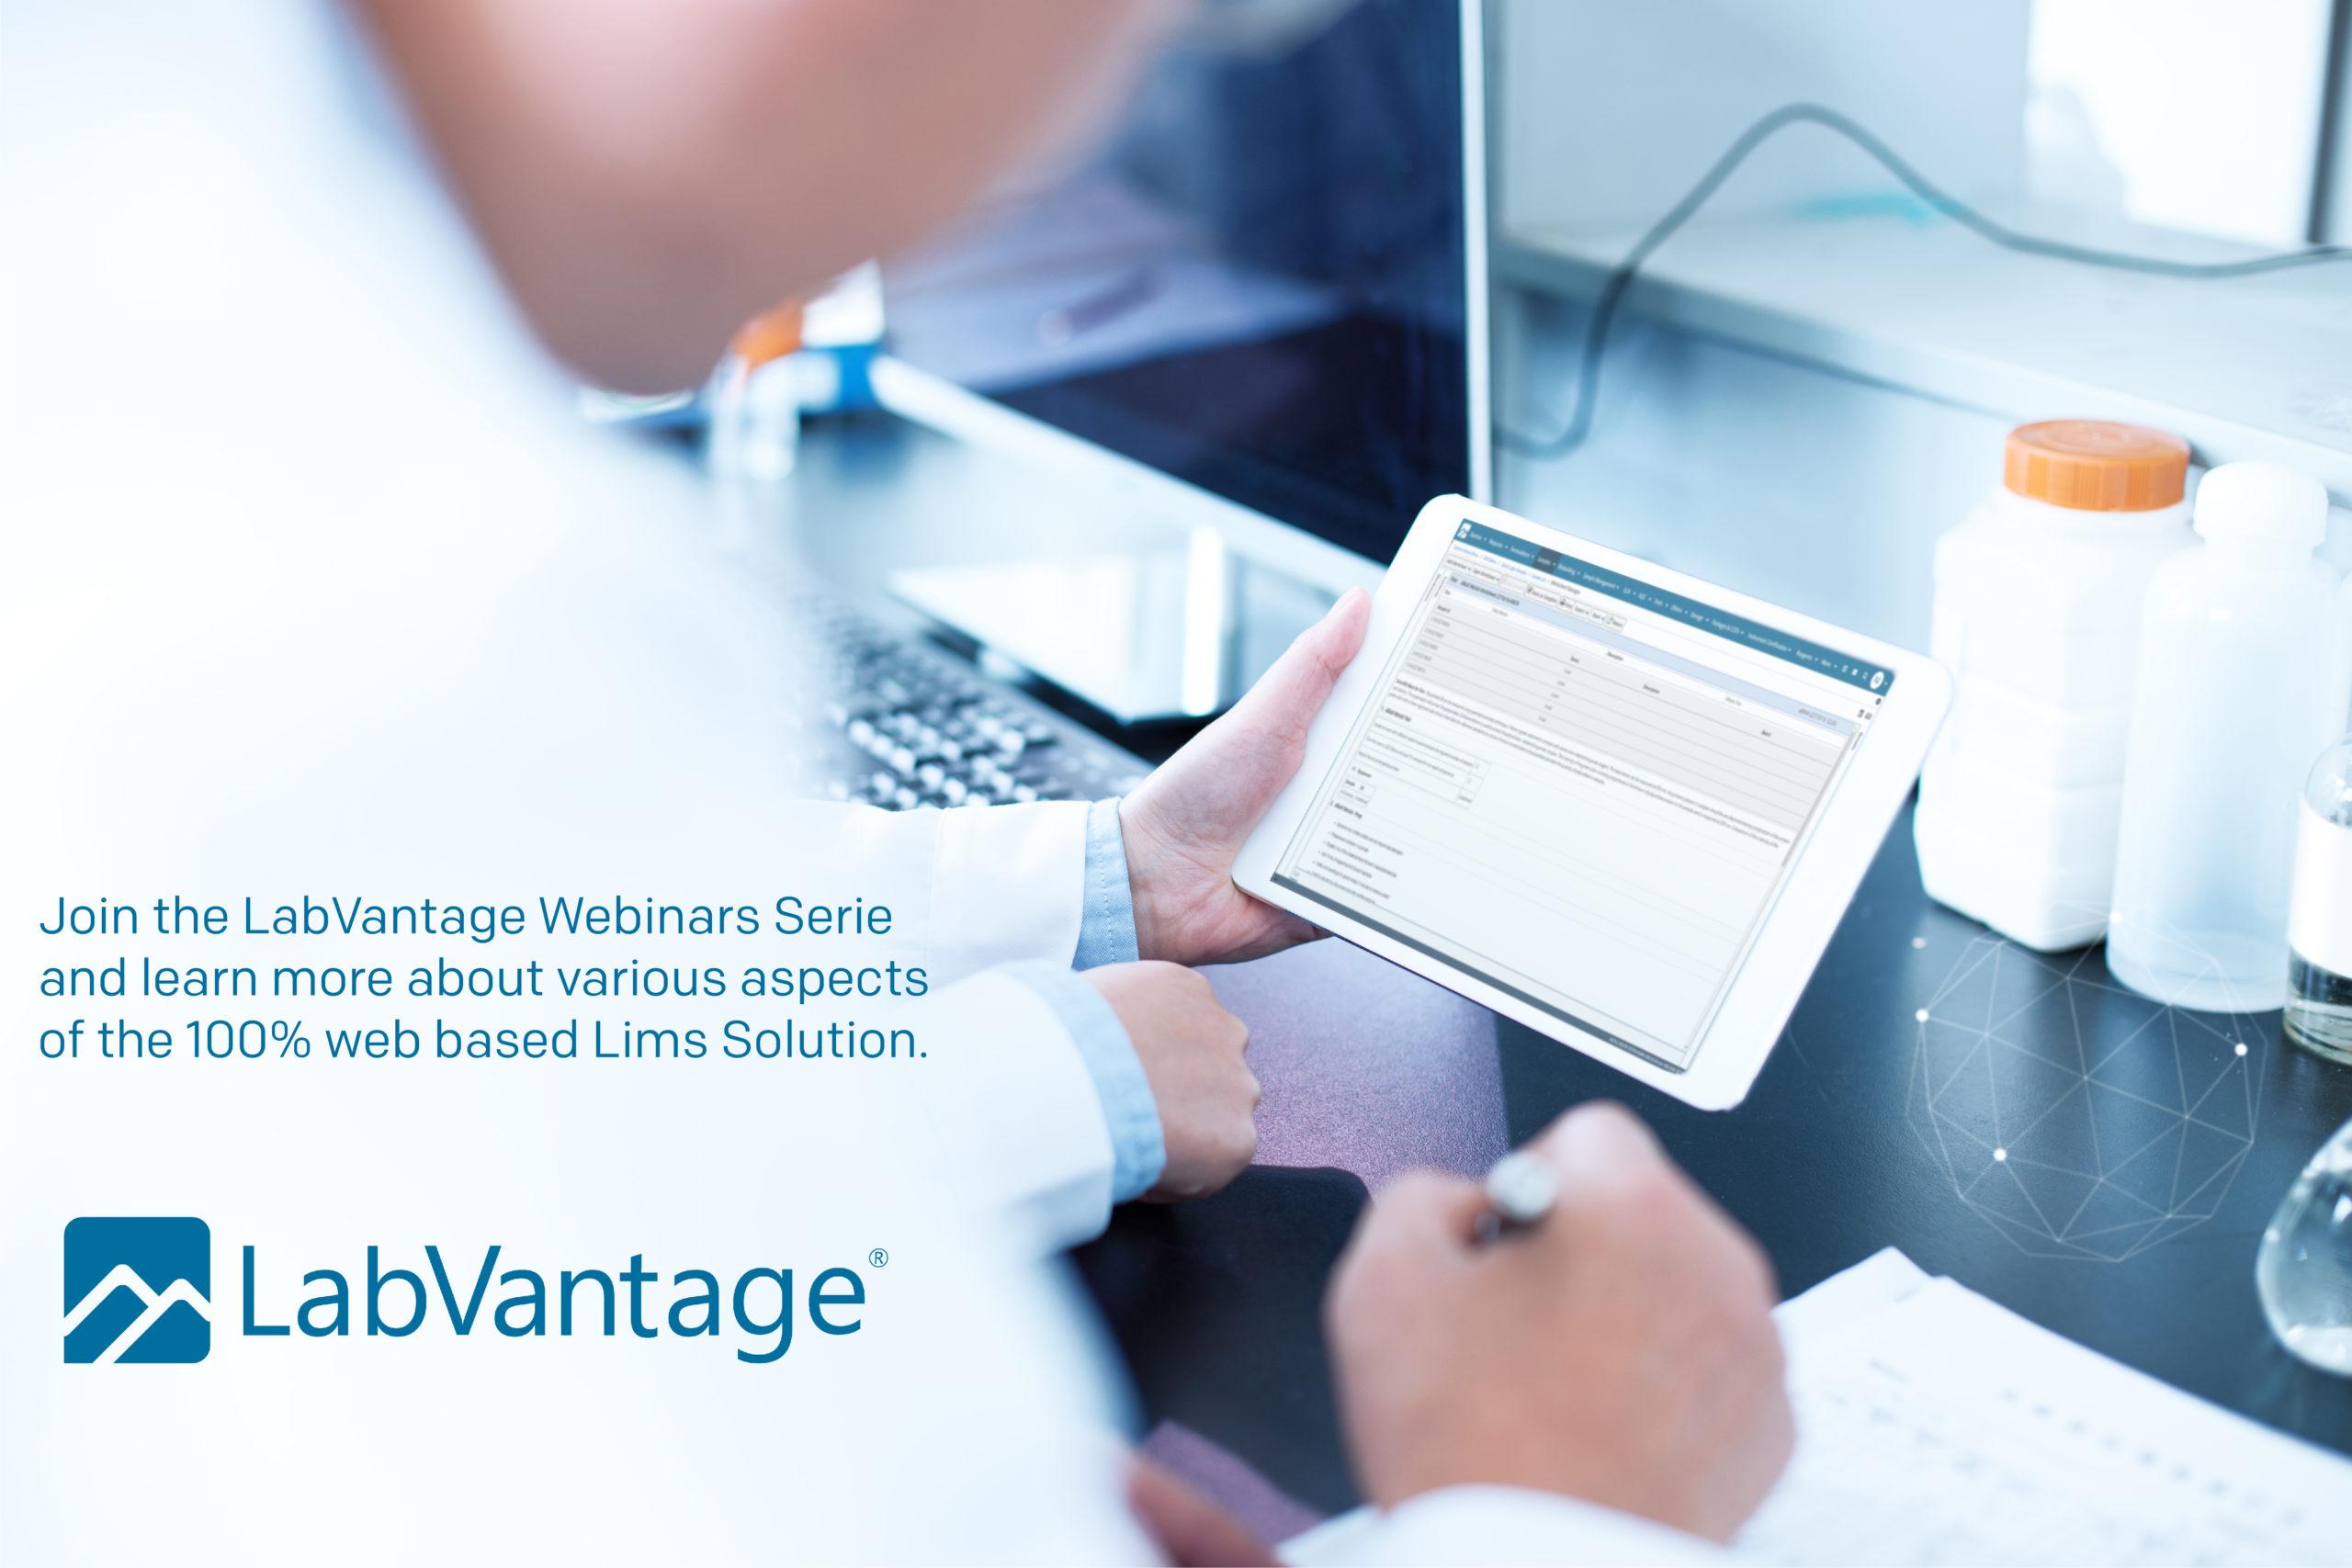 Labvantage webinar series